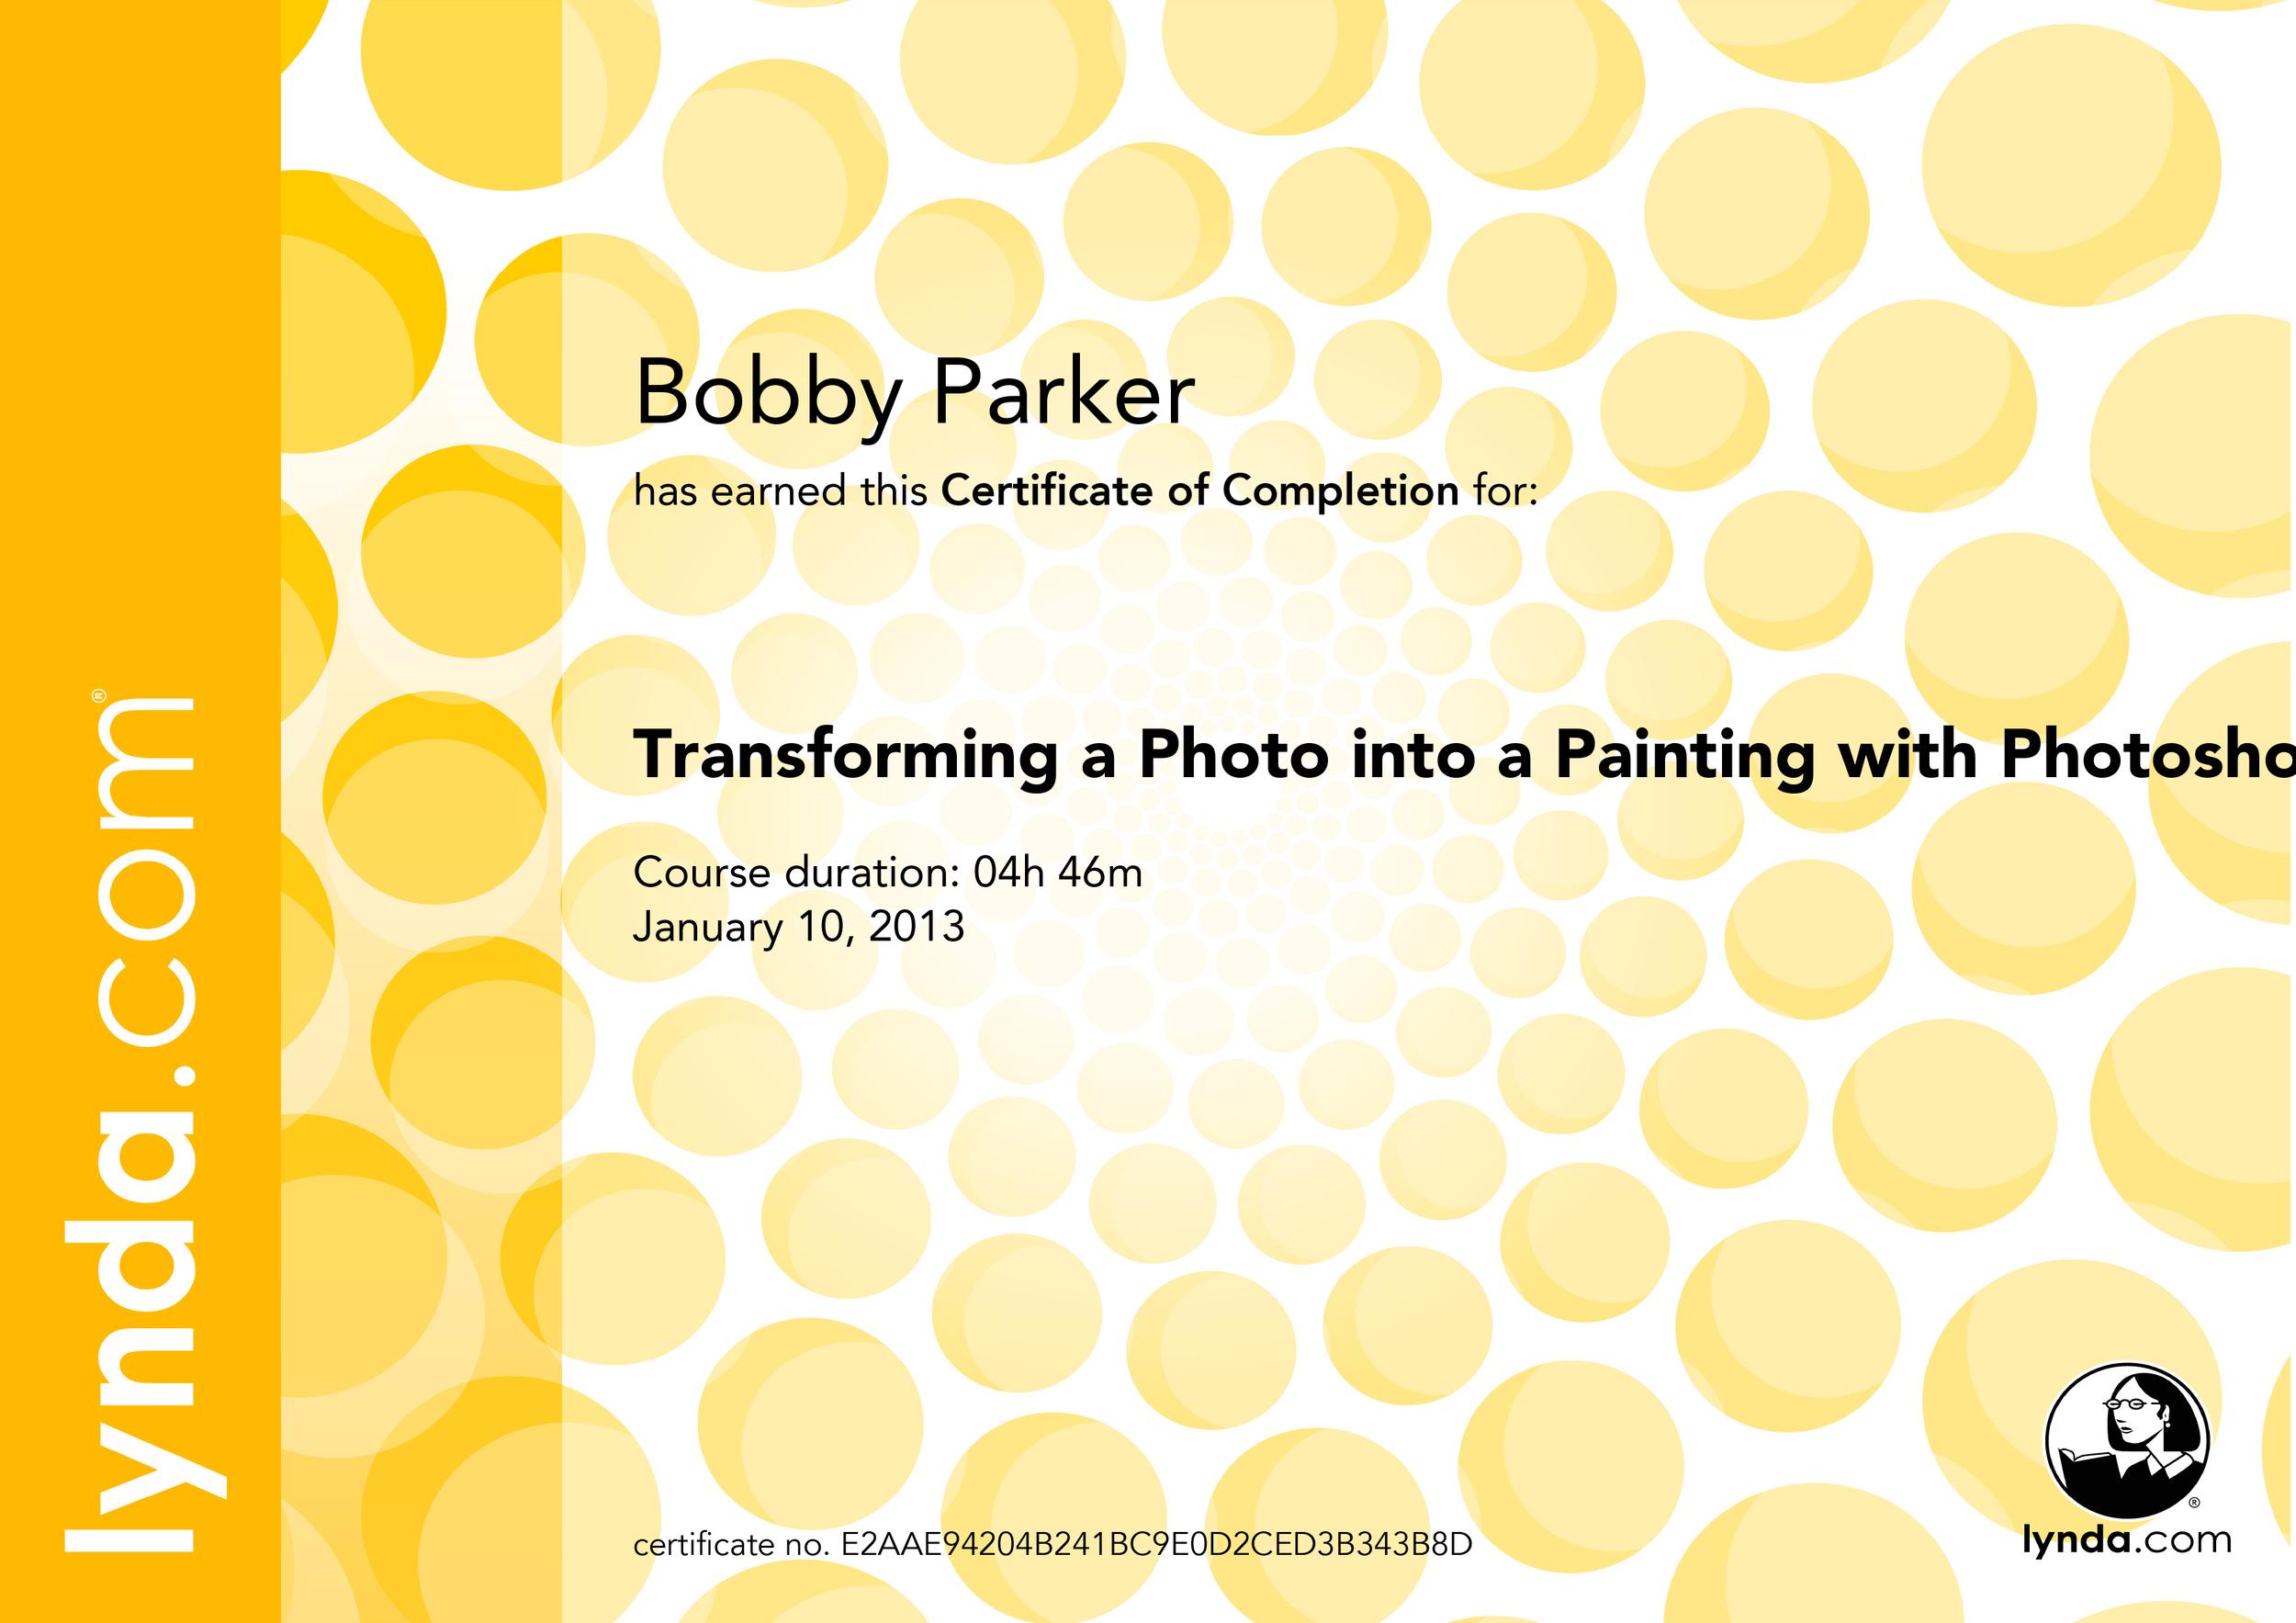 TransformingaPhotointoaPaintingwithPhotoshopCS6_CertificateOfCompletion.jpg